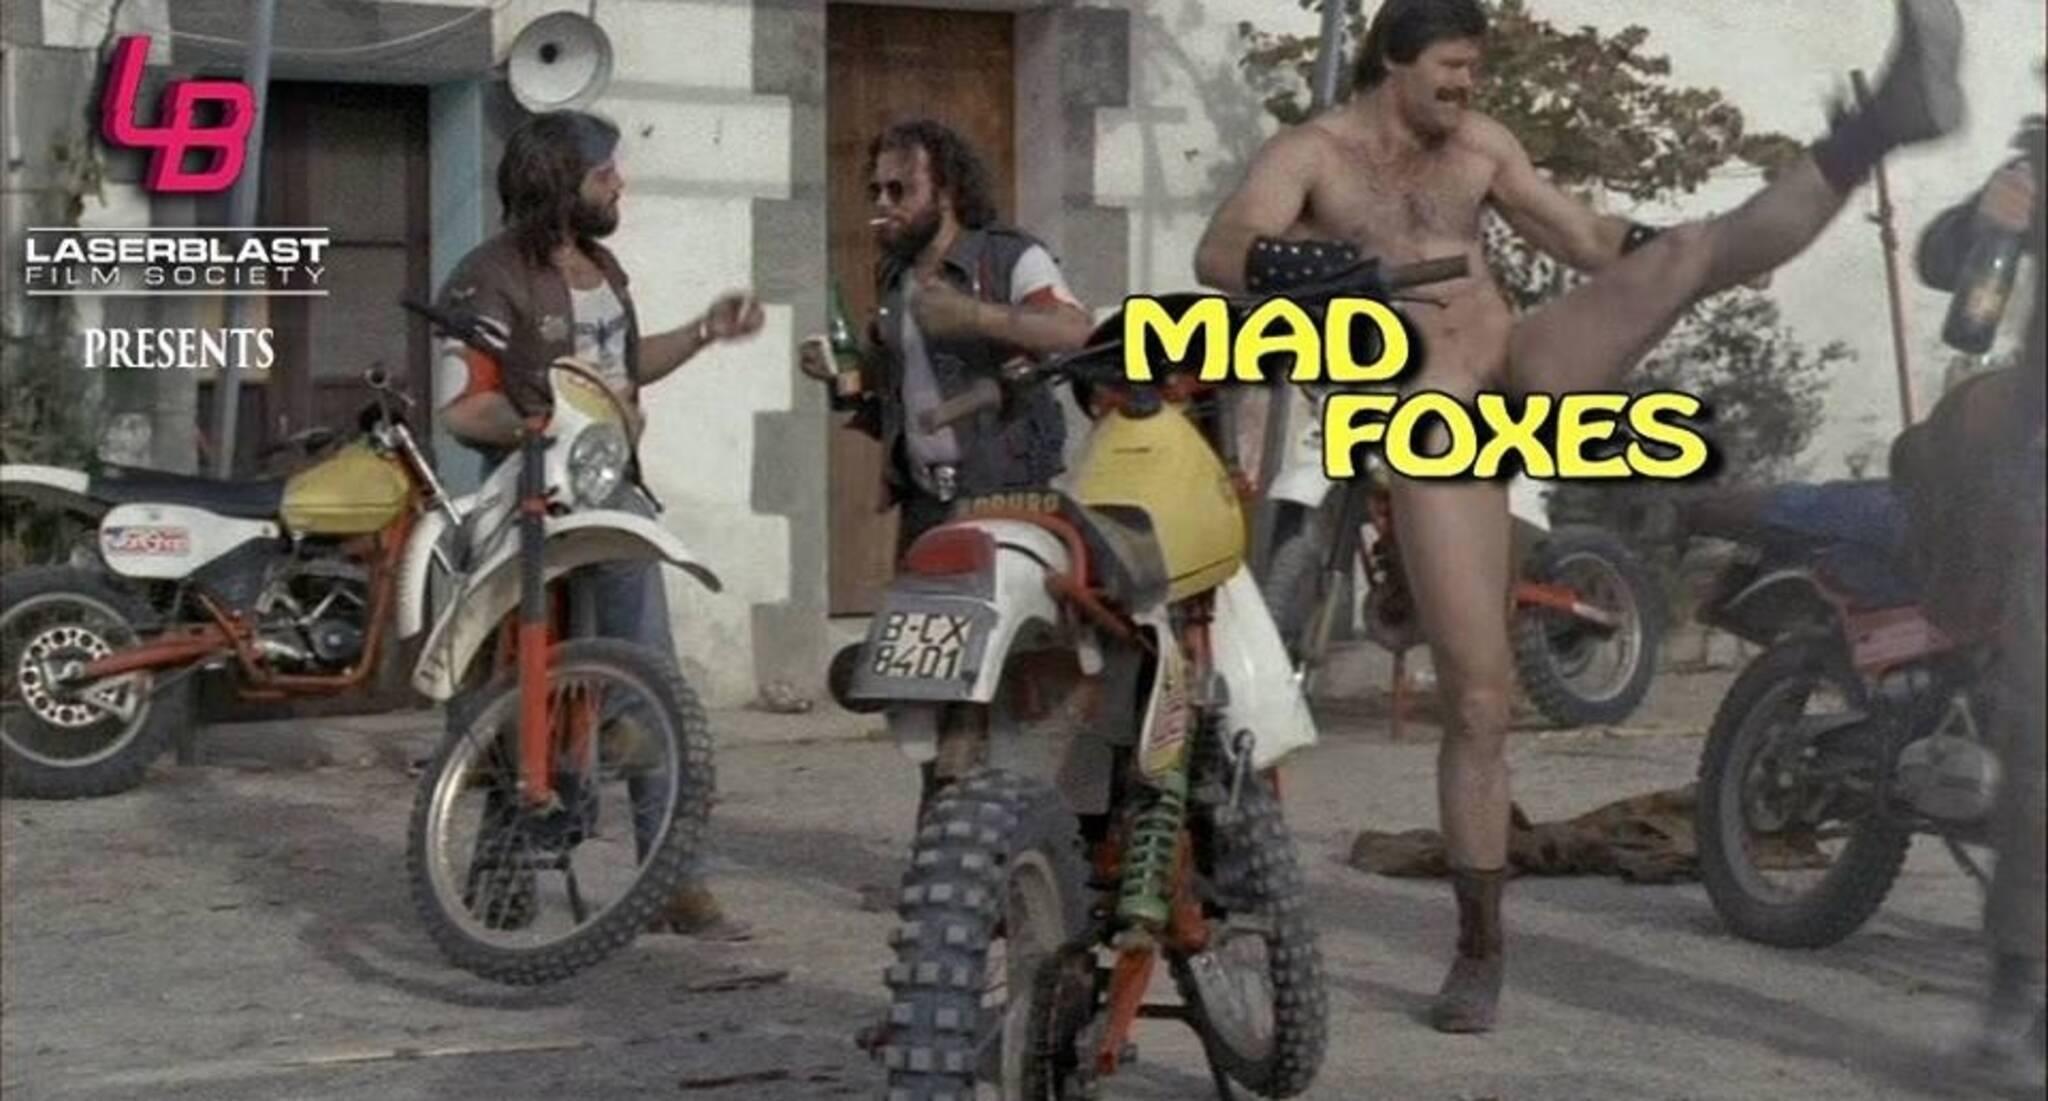 Andrea Albani laser blast film society: mad foxes at the royal